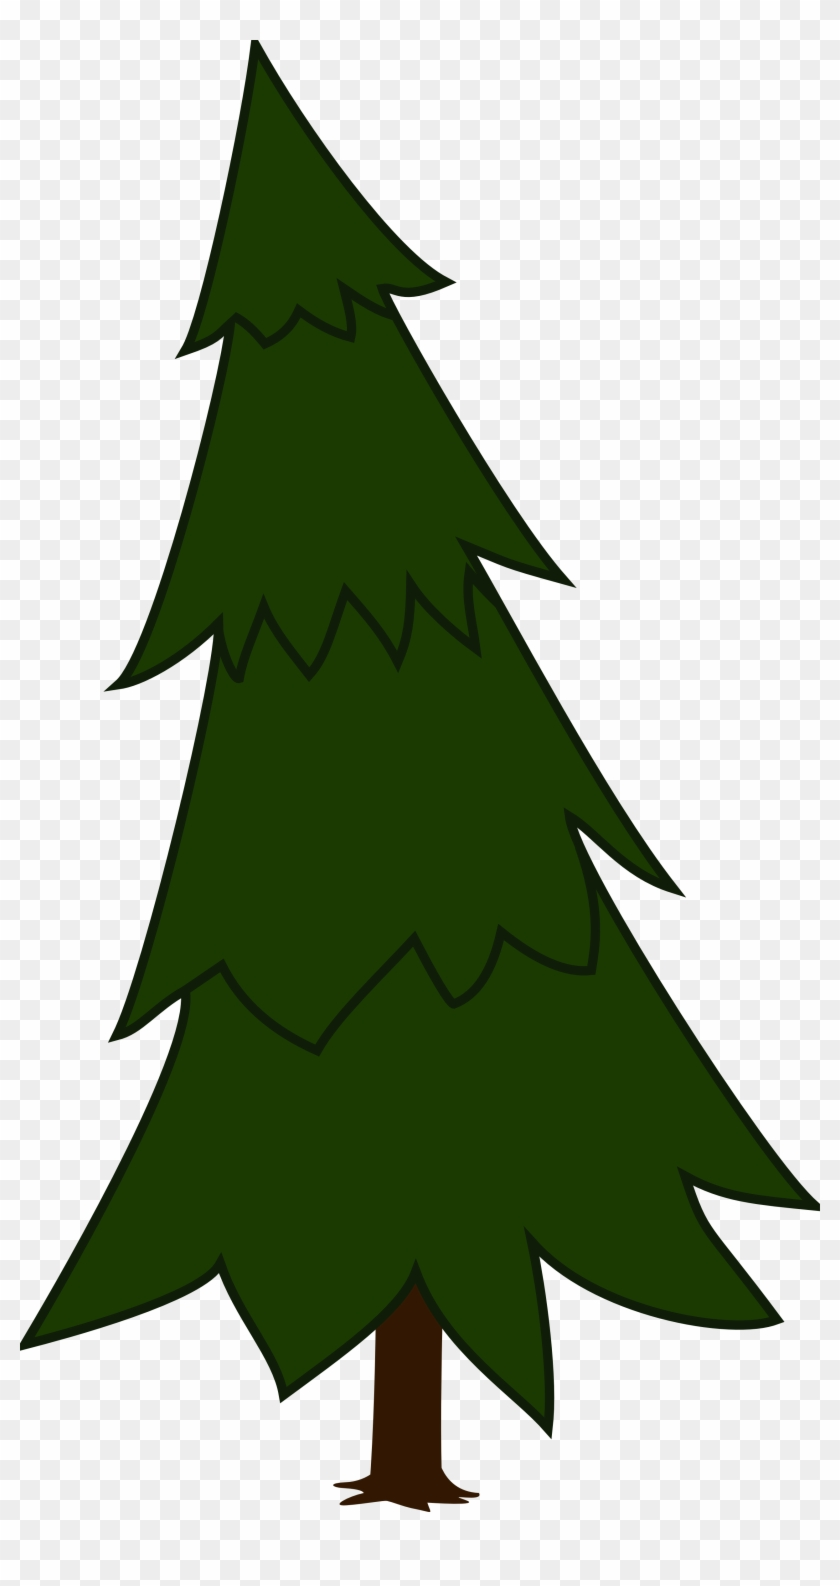 Pine Tree Svg Clipart - Pine Tree Svg Clipart #449